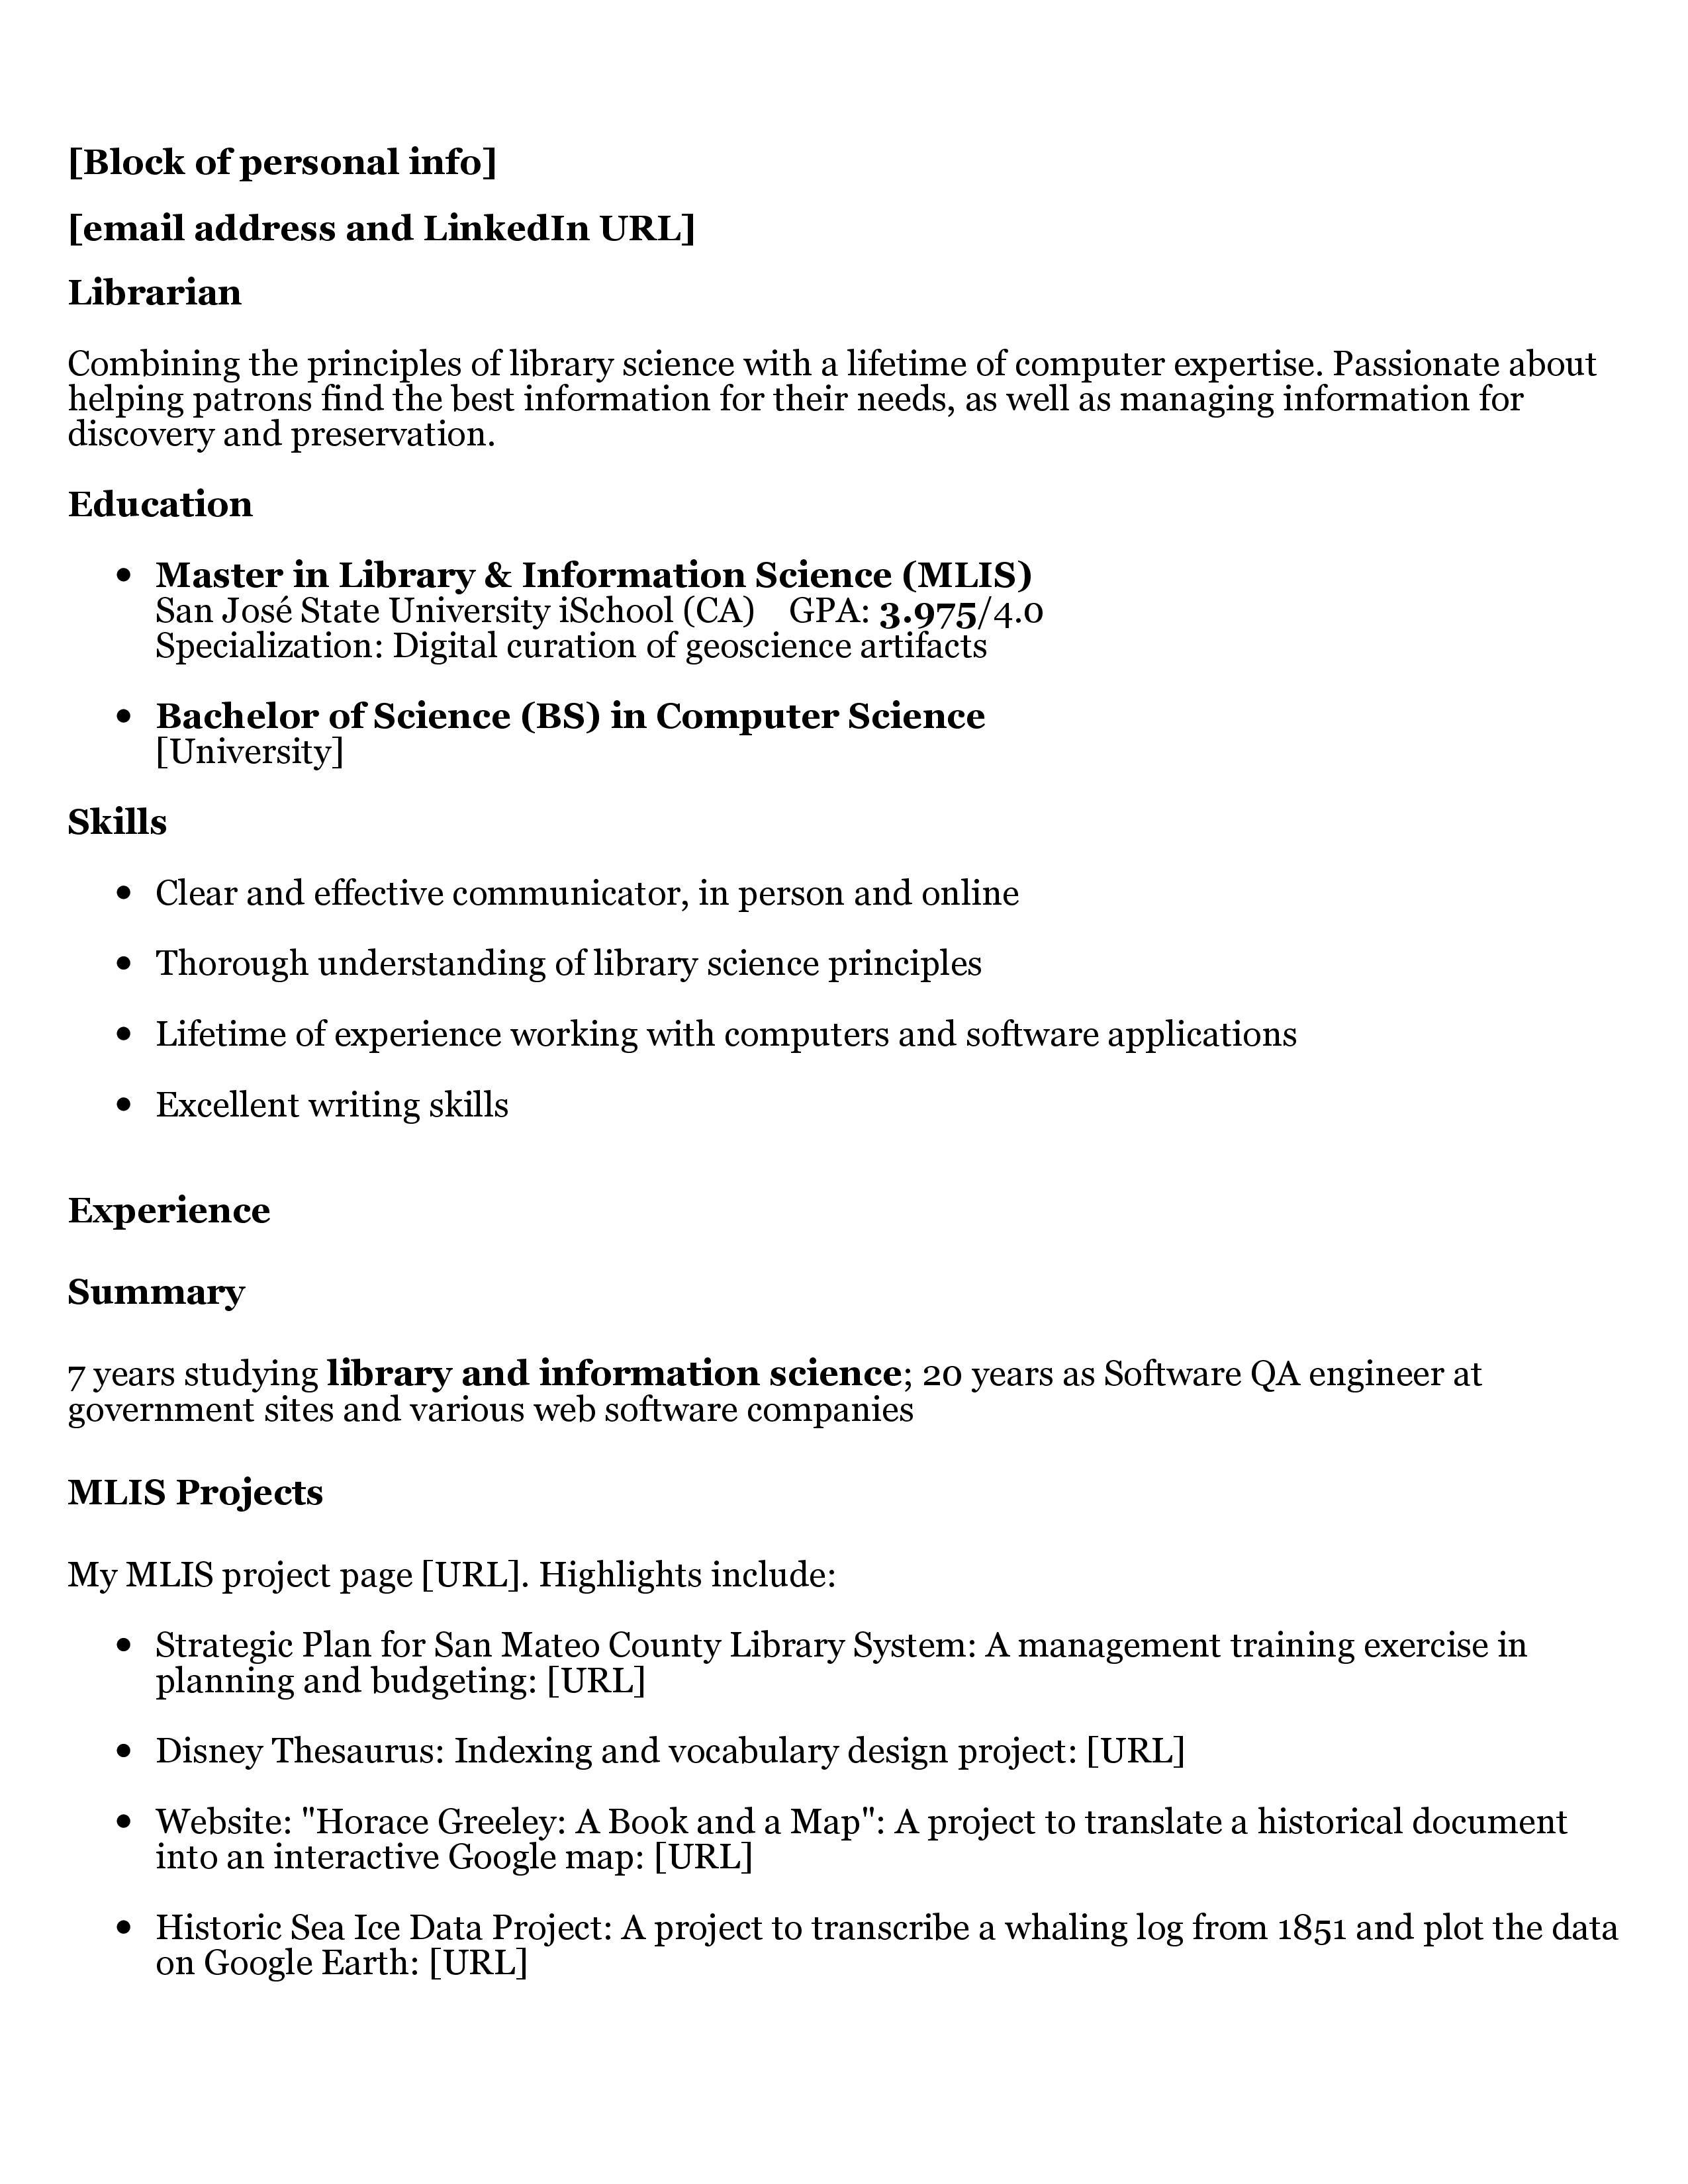 Resume Verb Tense Current Job